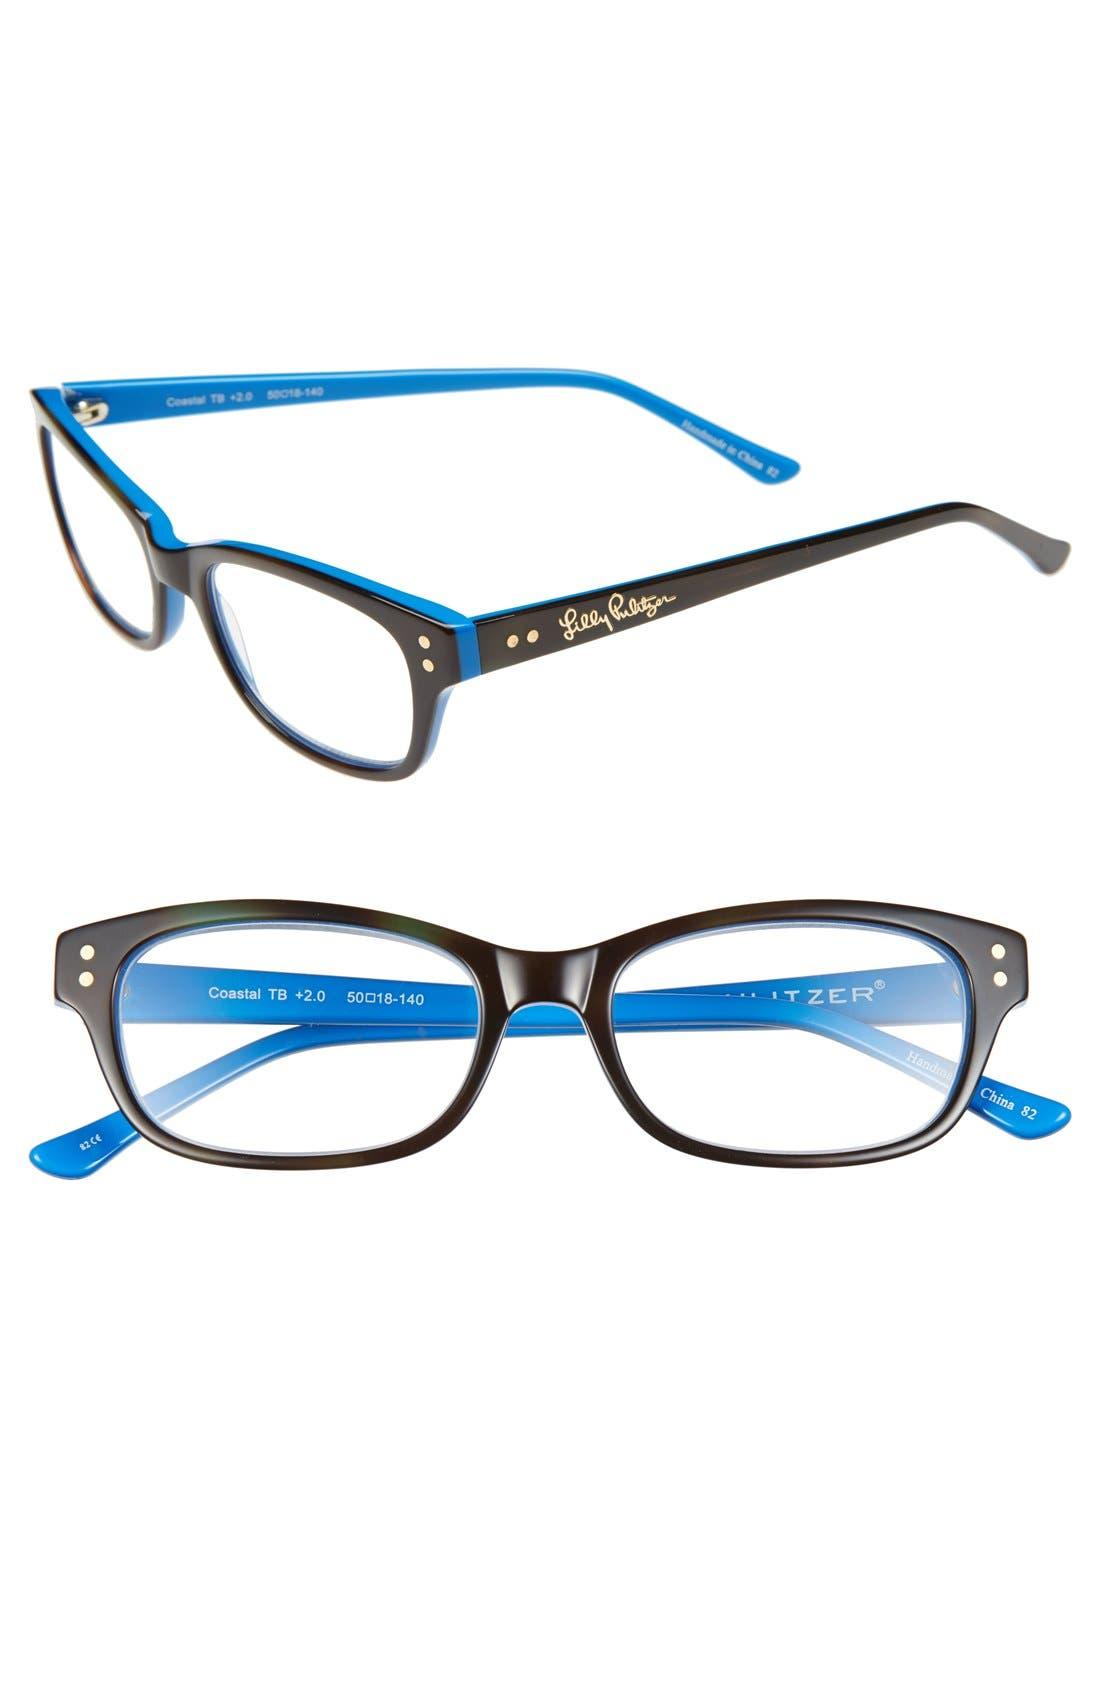 Main Image - Lilly Pulitzer® 'Coastal' 50mm Reading Glasses